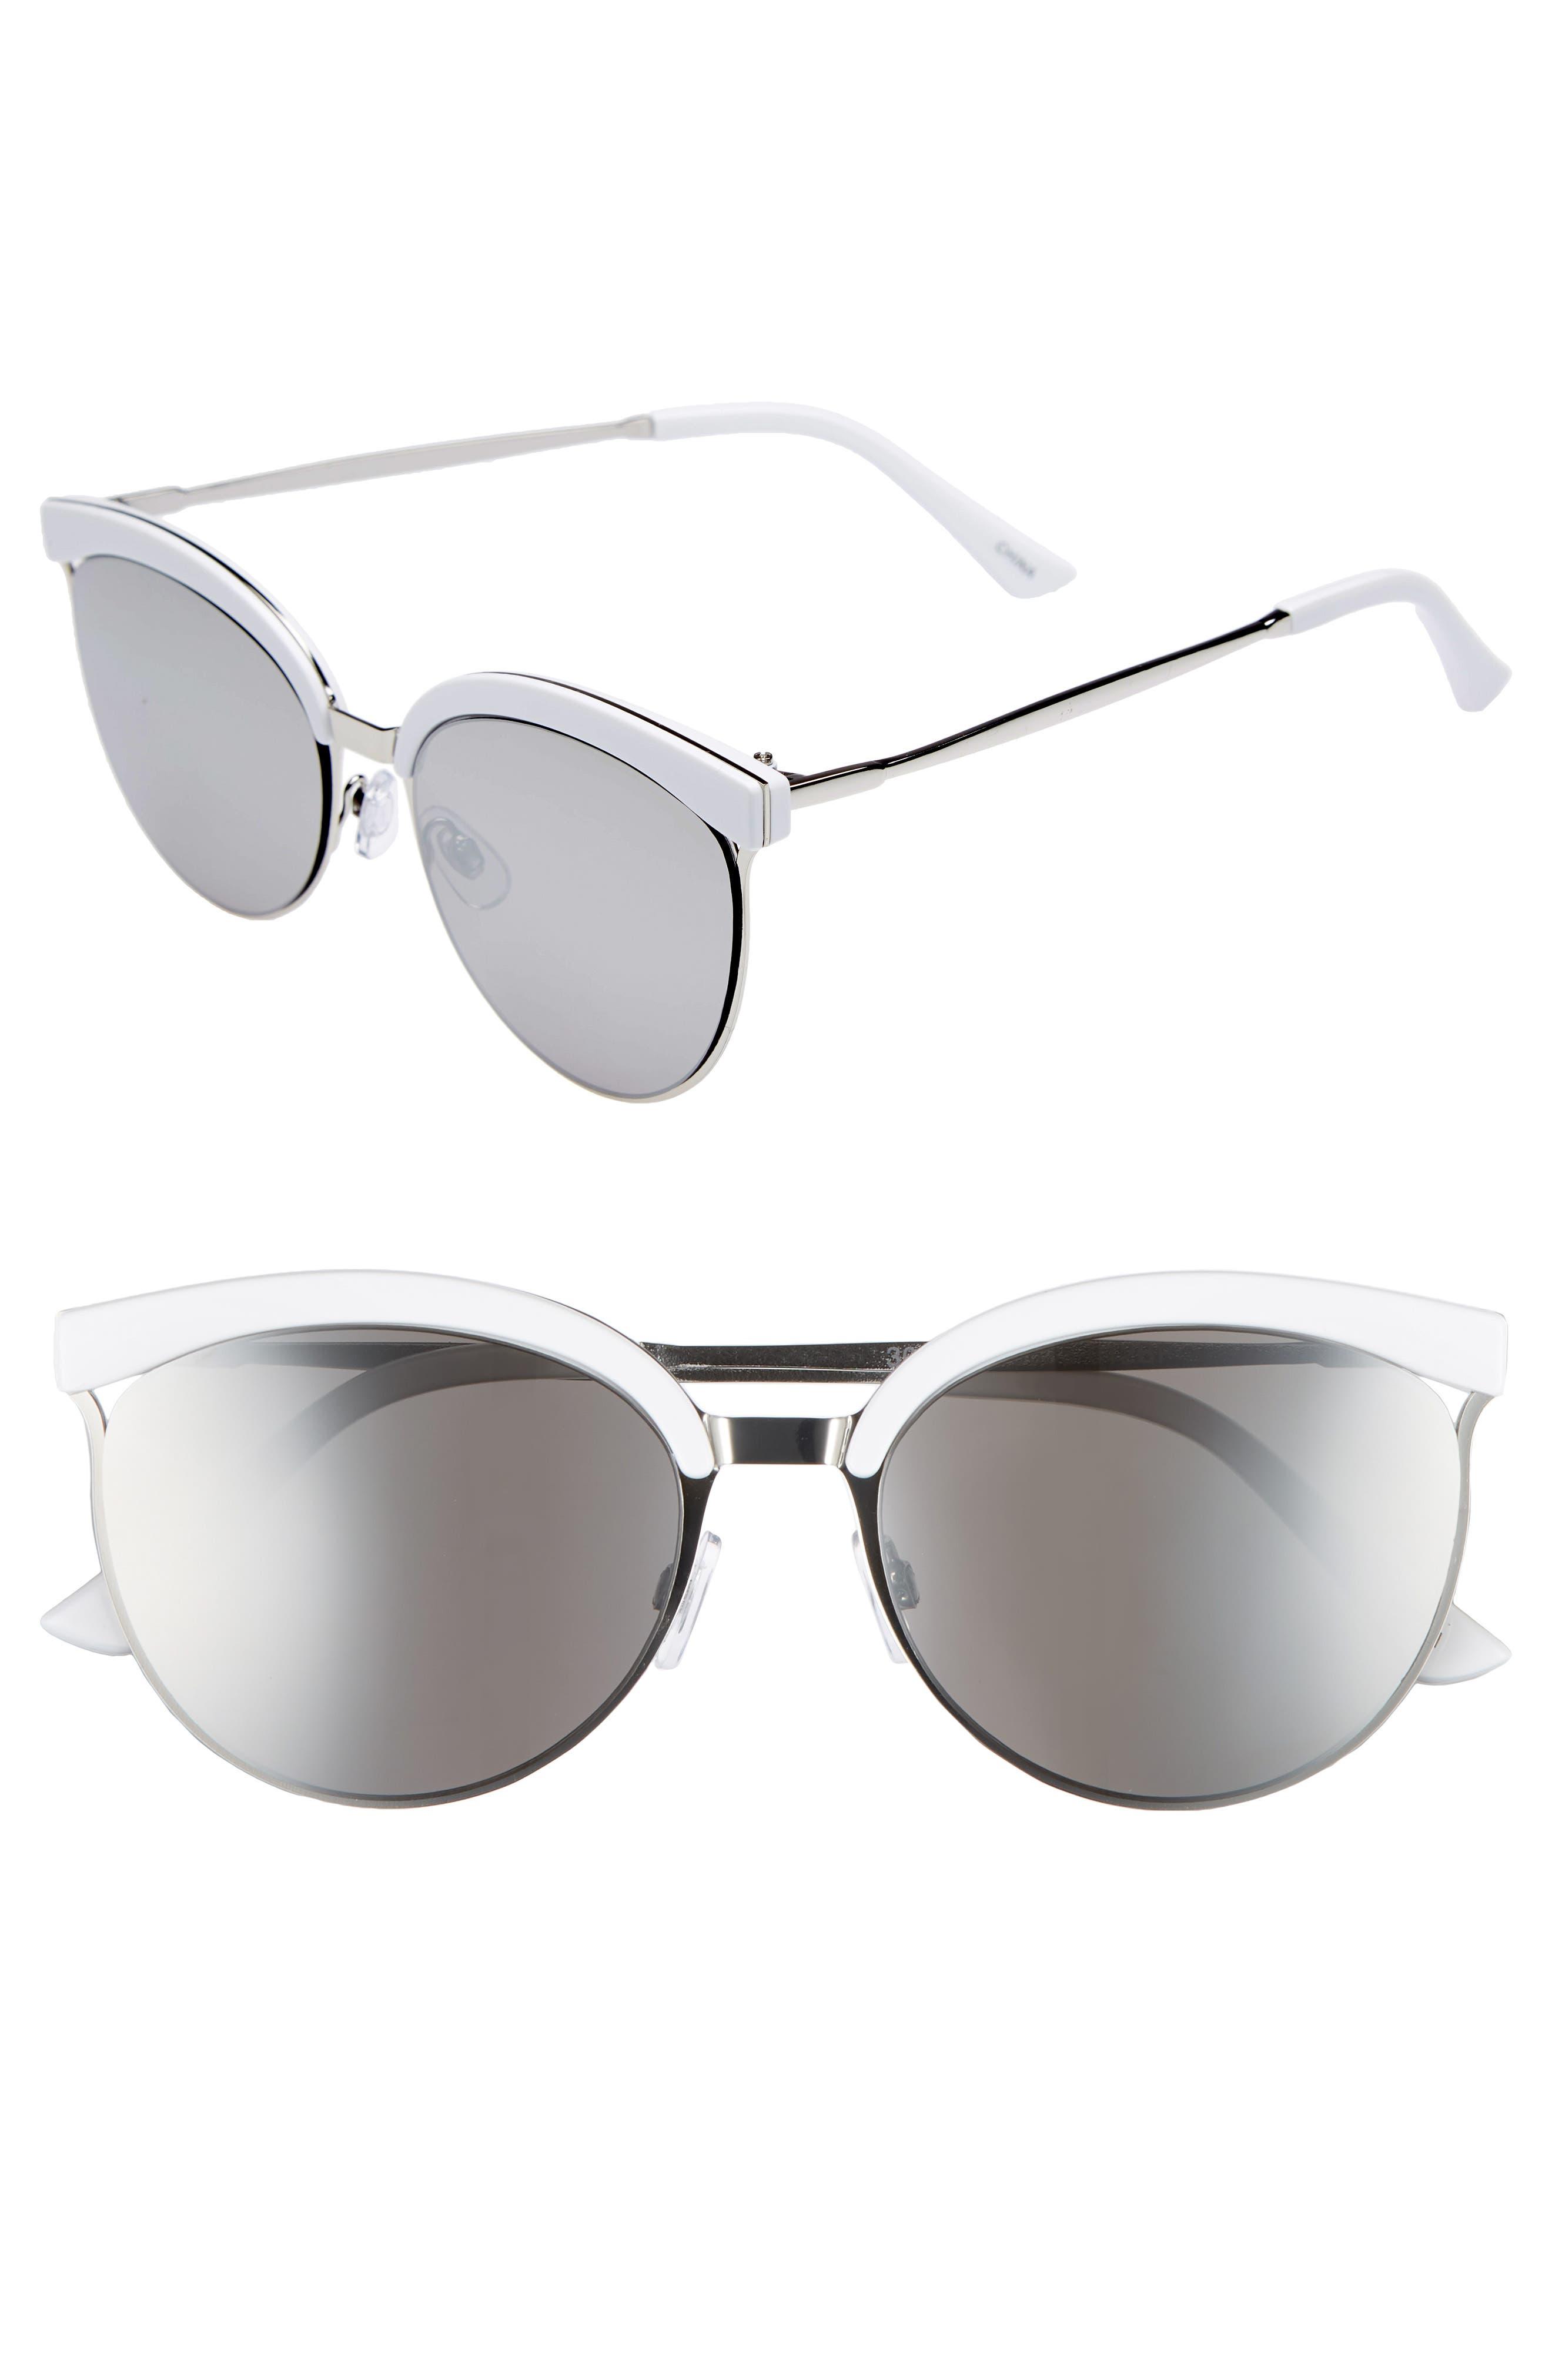 57mm Round Sunglasses,                         Main,                         color, 100